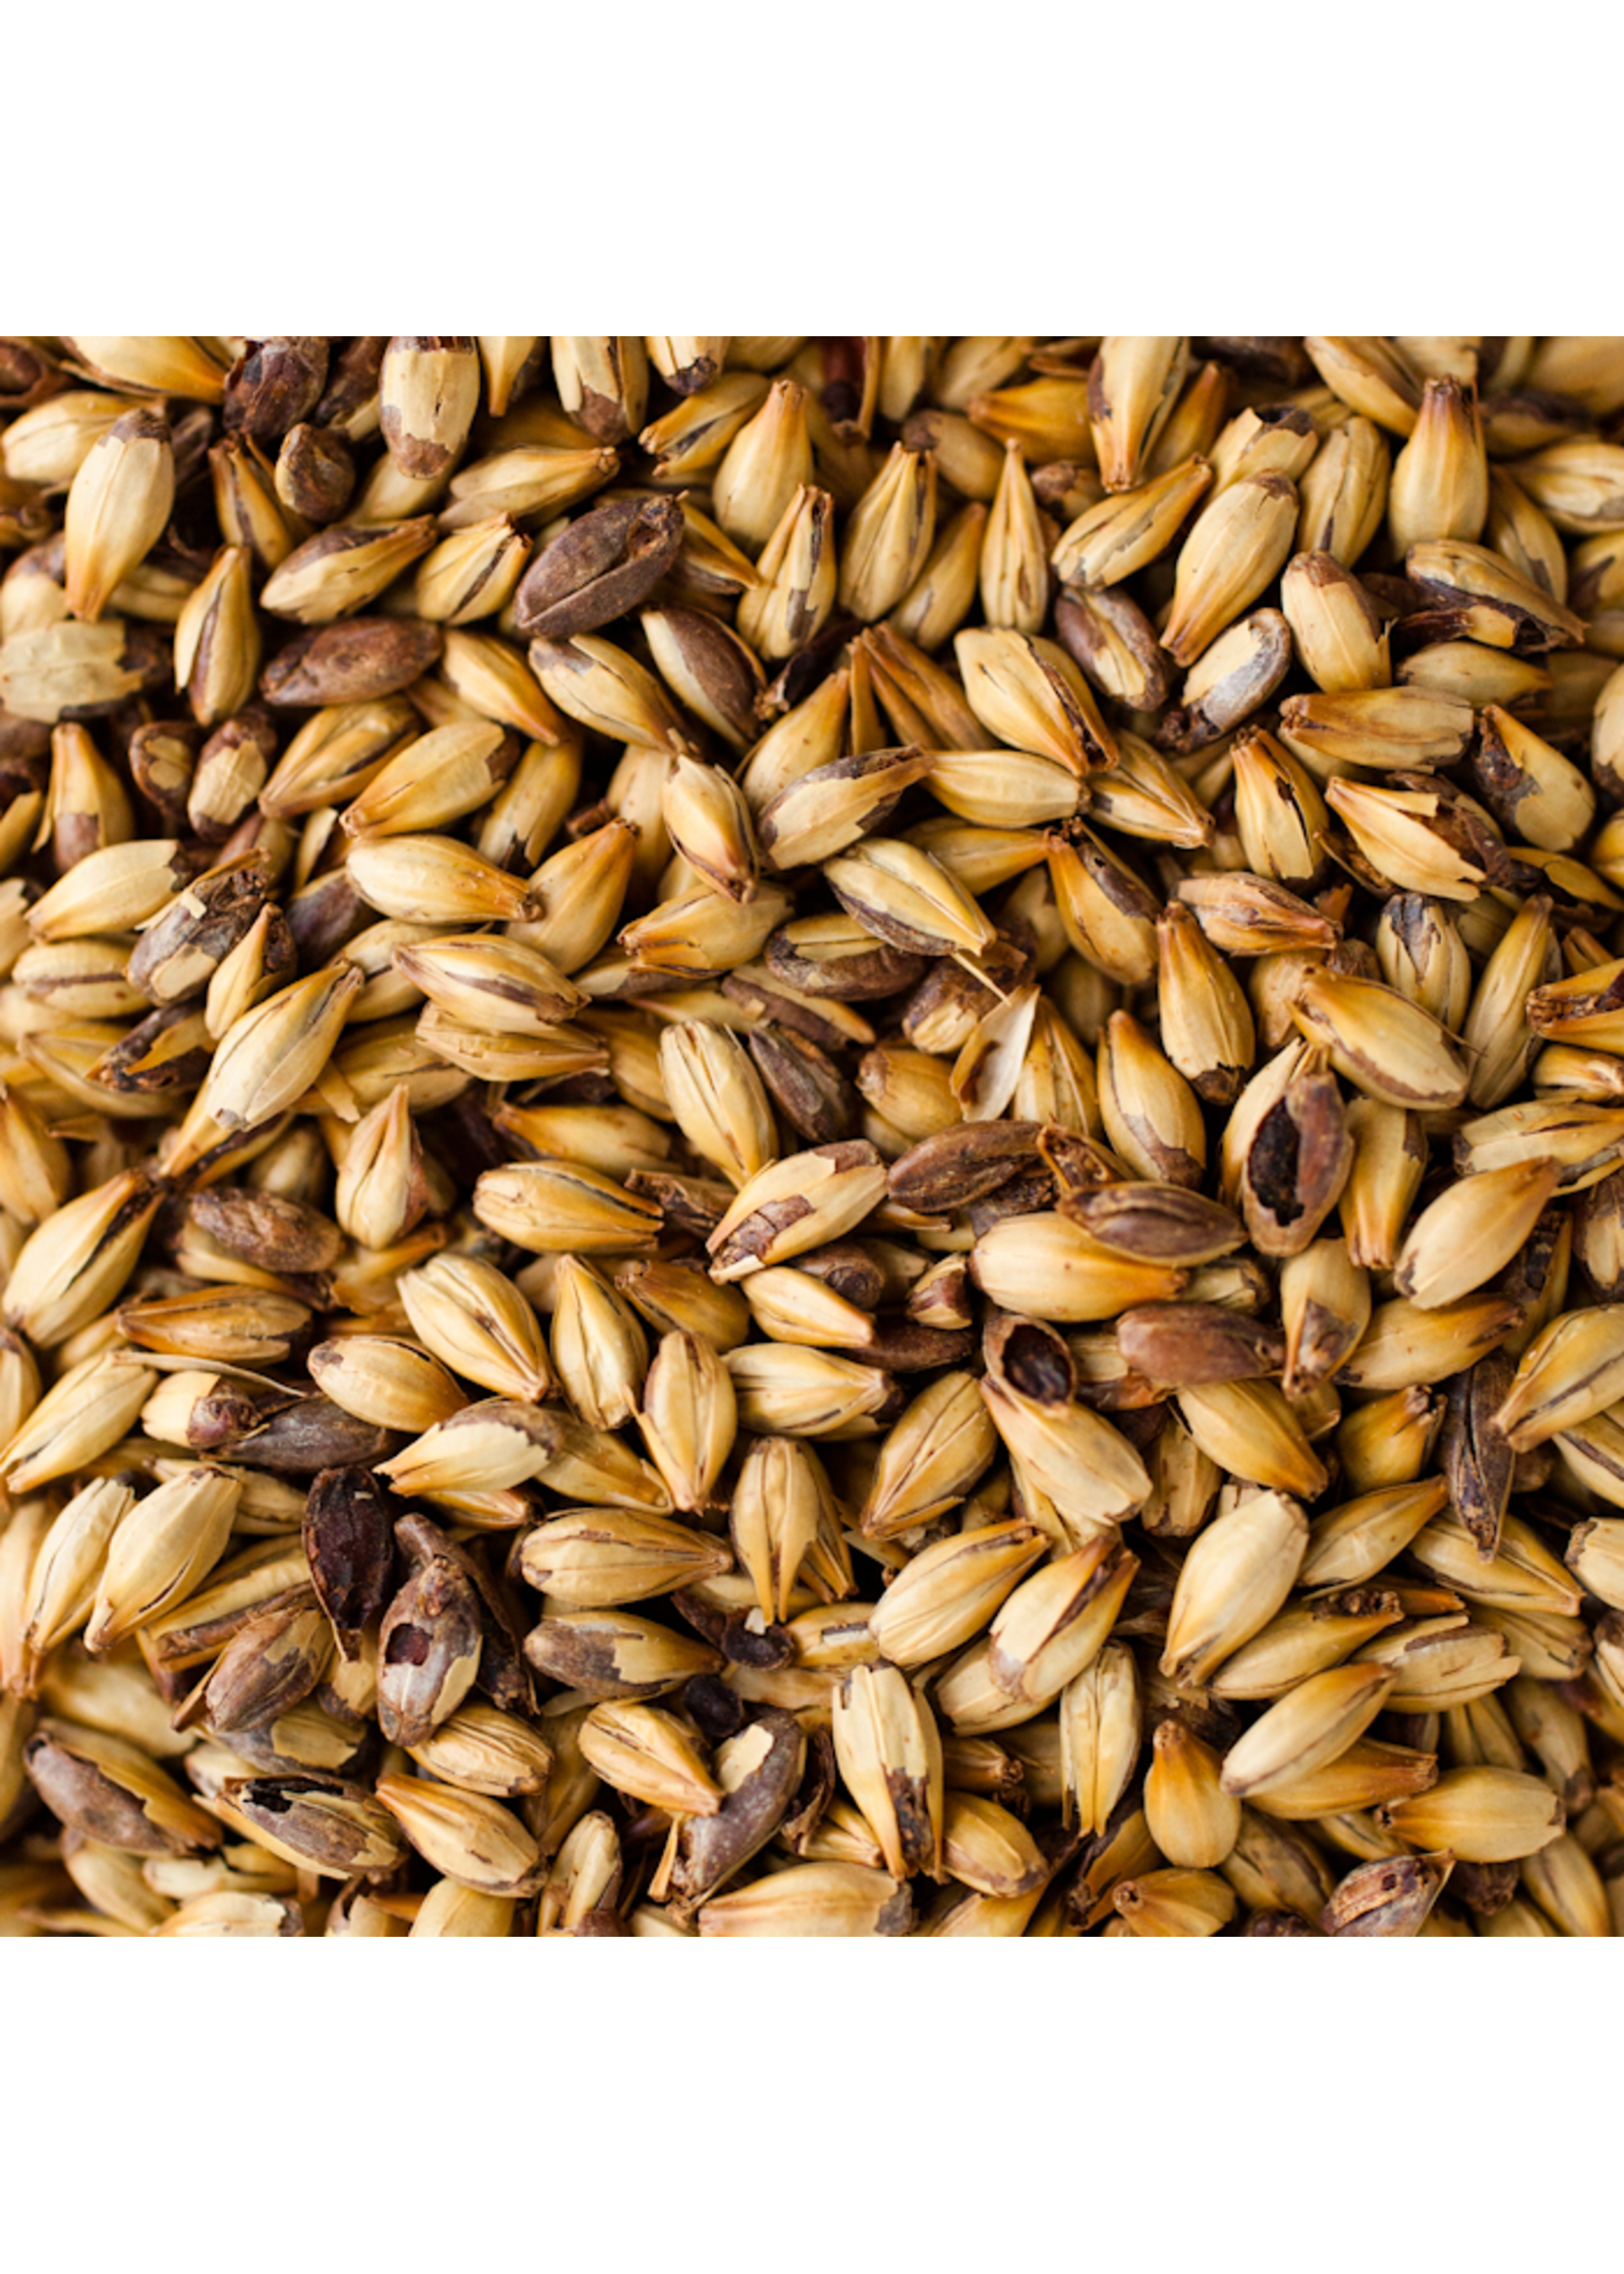 Grain Briess Caramel Munich 60L - D40 - 1 LB